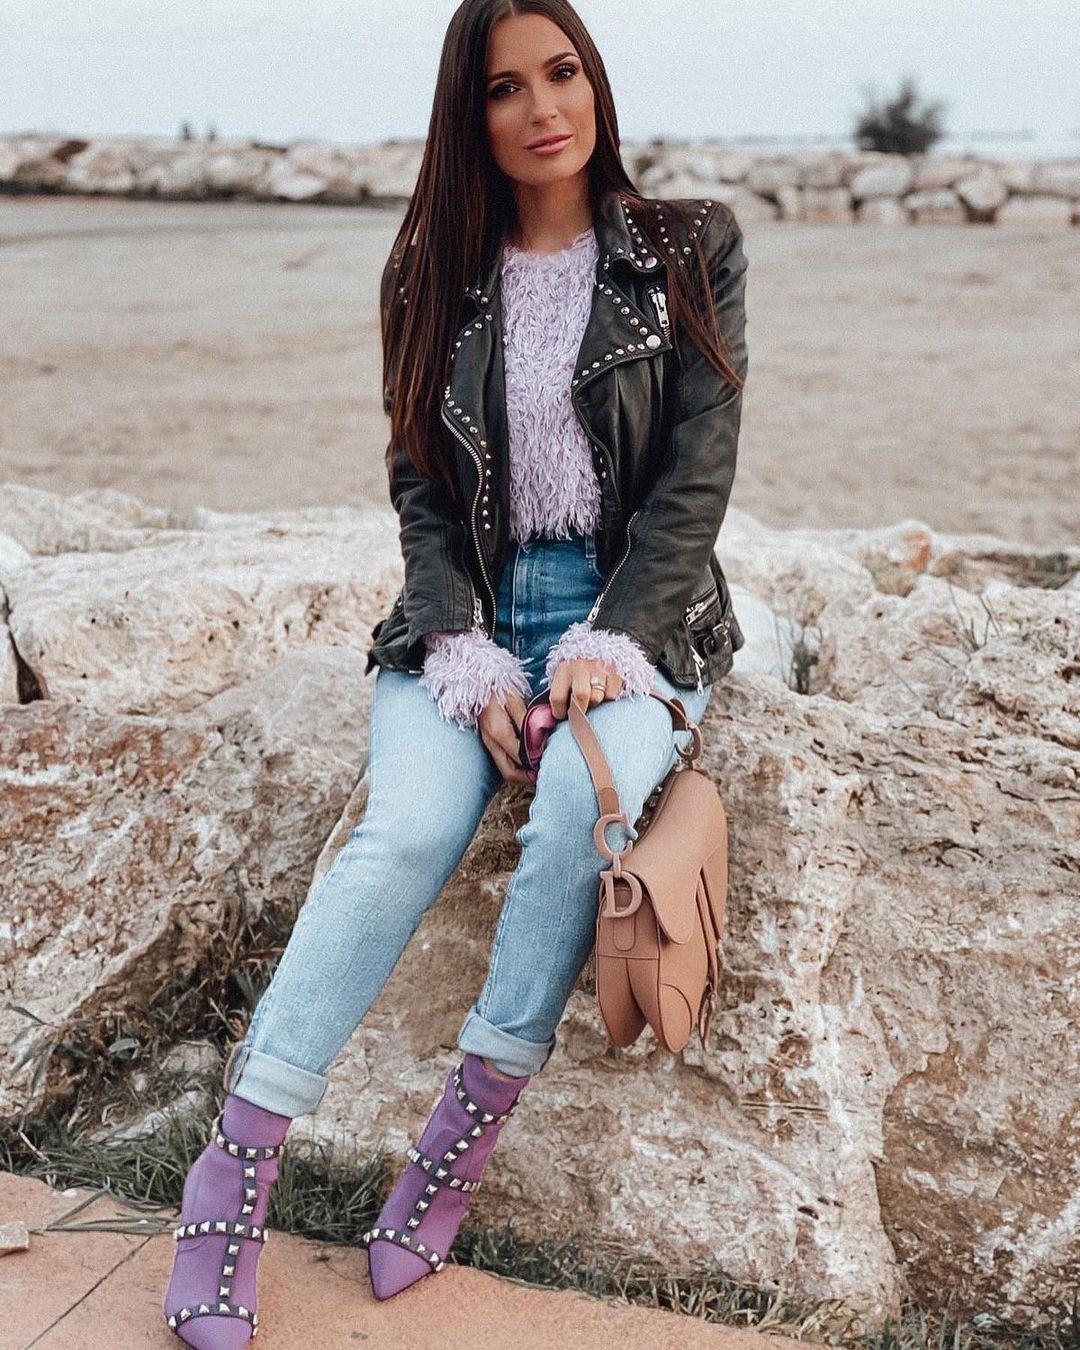 Alessia-Macari-Wallpapers-Insta-Fit-Bio-2